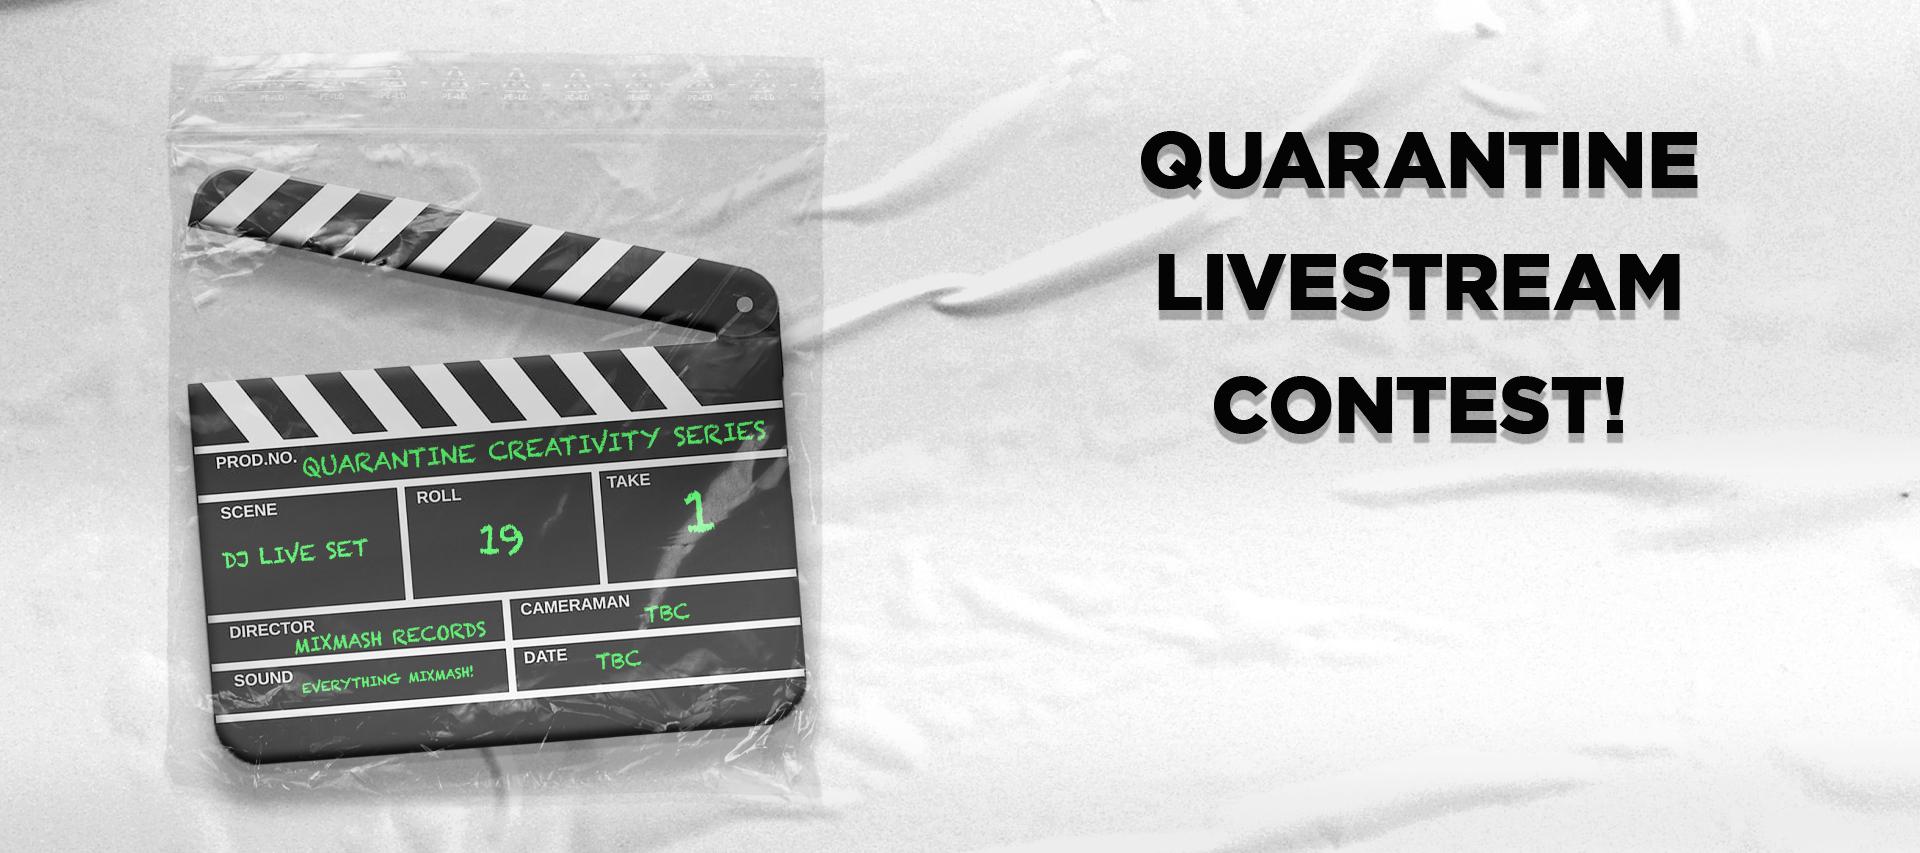 Episode 2 - Quarantine series:  Calling all DJs - Get paid 300 Euro to DJ on livestream!